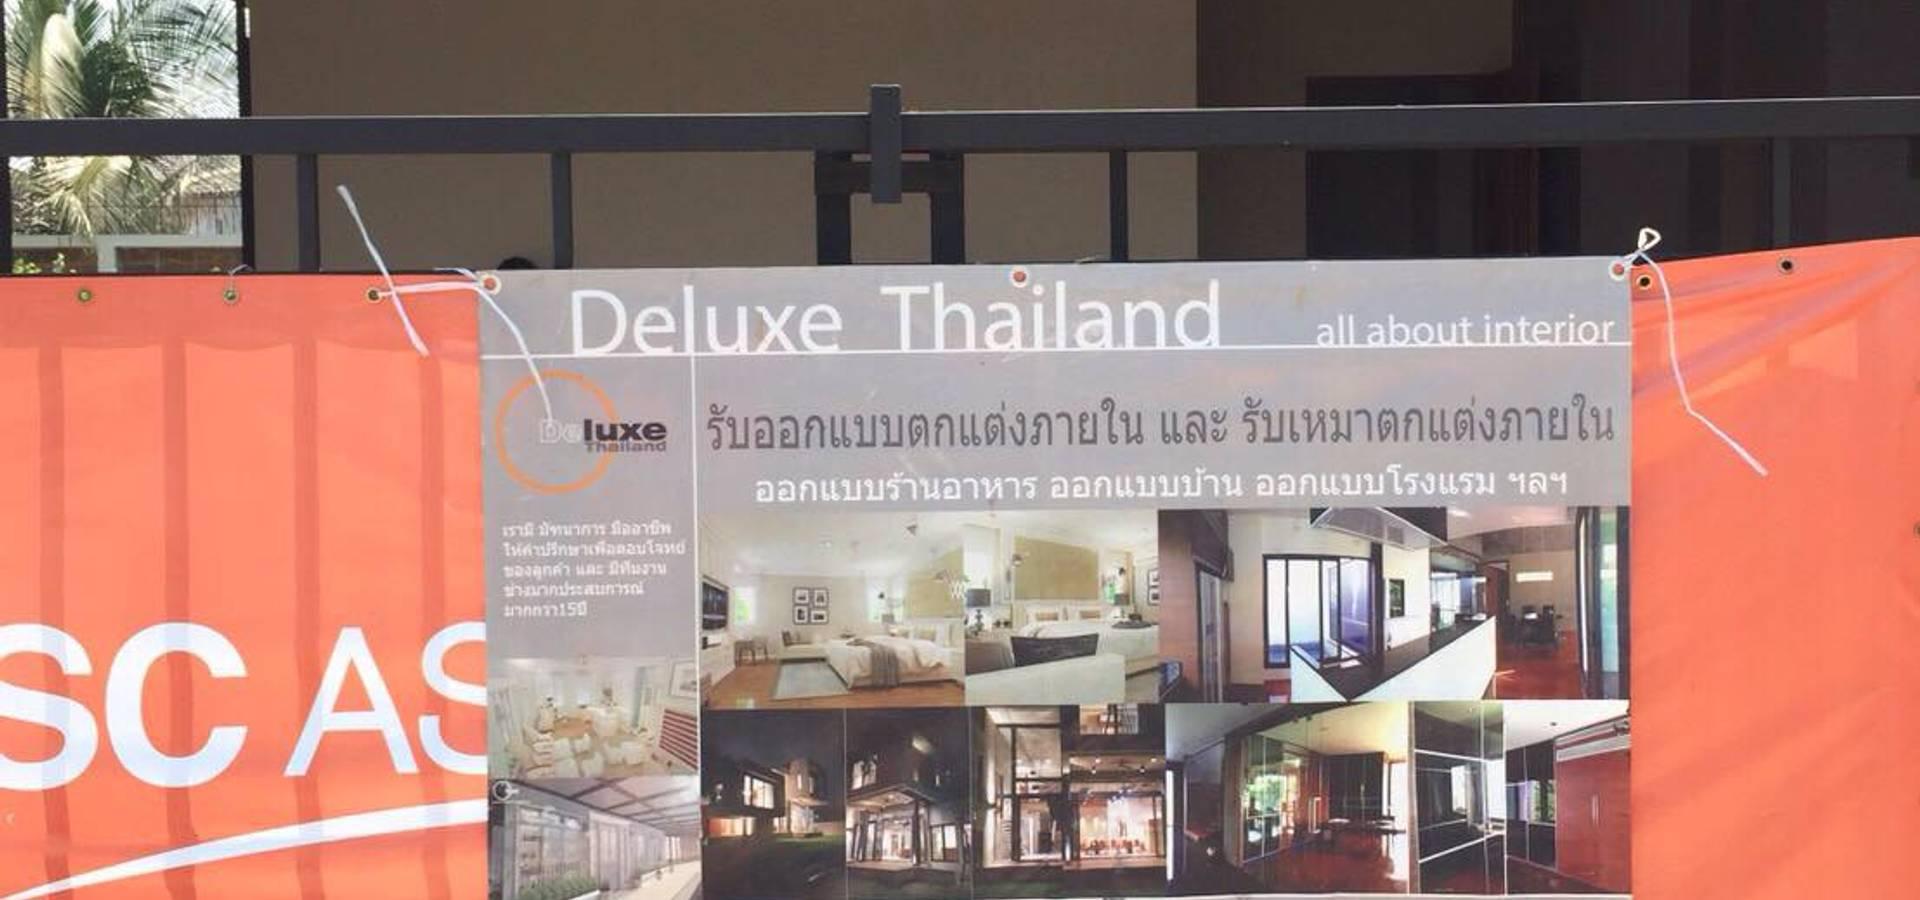 Deluxe Thailand